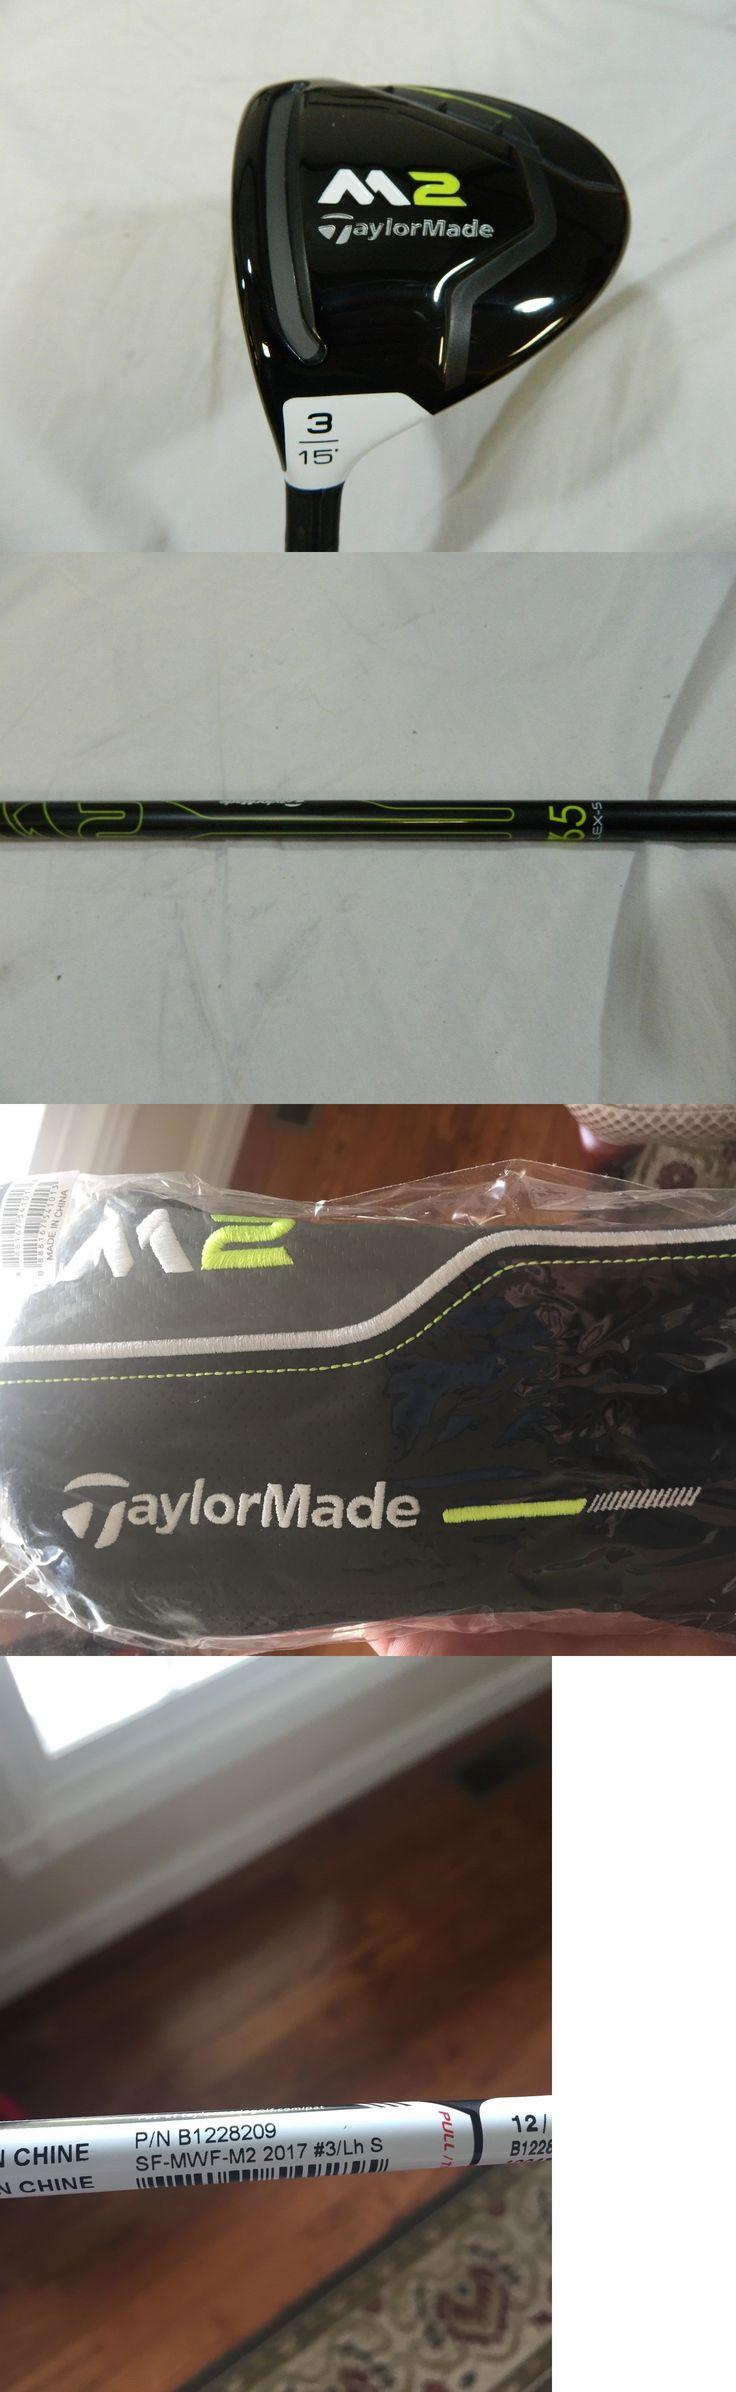 Golf Clubs 115280: New!!! Lh 2017 Taylormade M2 15* 3 Fairway Wood Reax 65 Stiff Flex Free Ship -> BUY IT NOW ONLY: $149.99 on eBay!